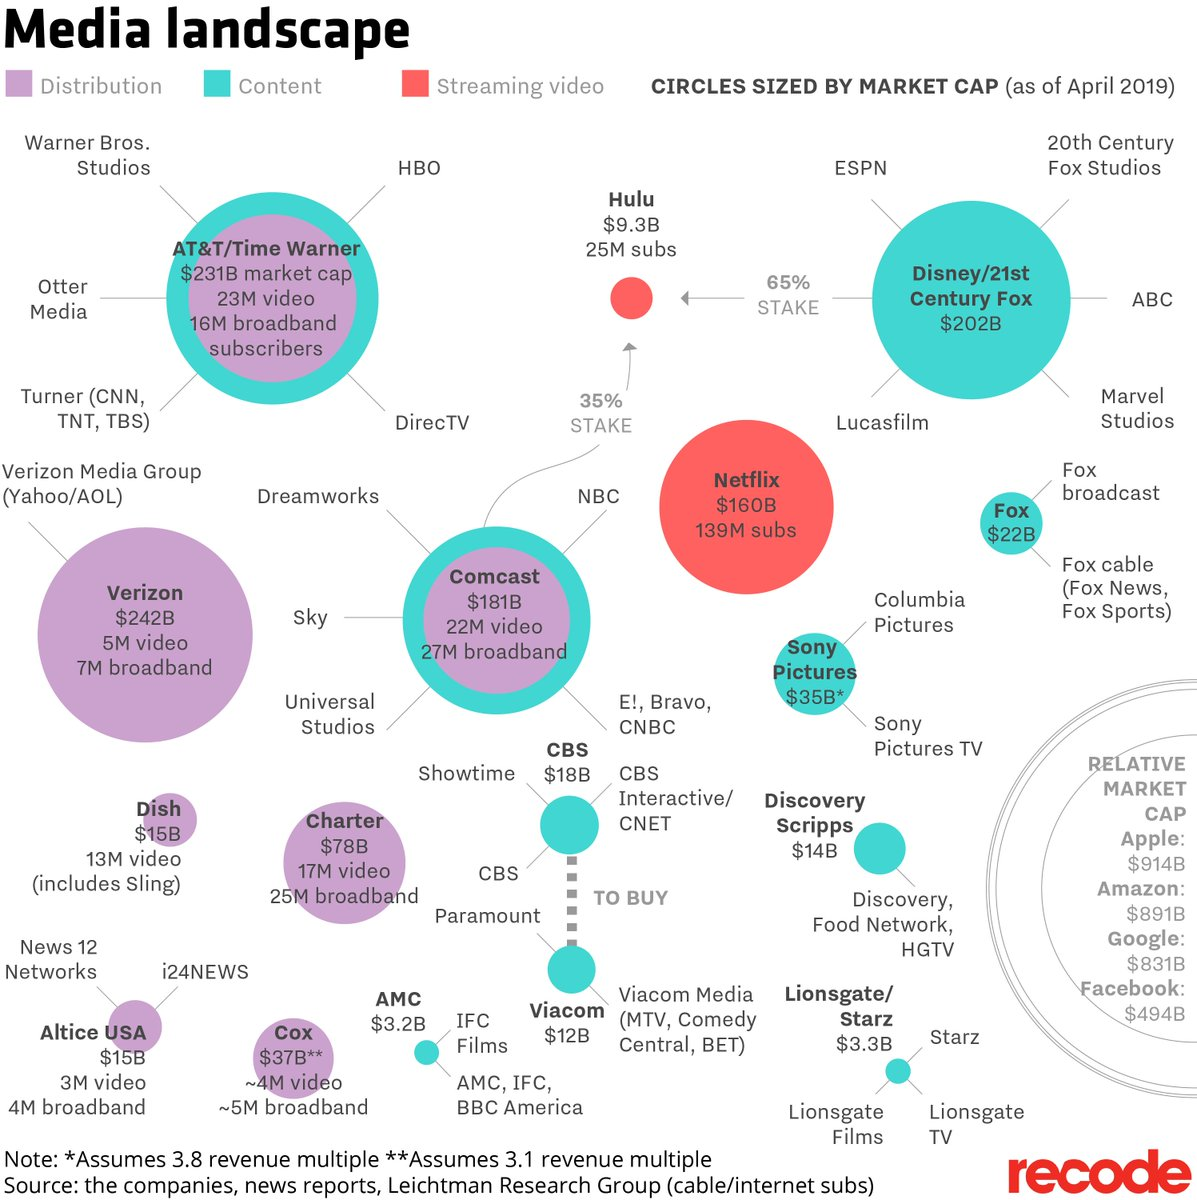 RT @ranimolla: @pkafka Now the media map looks like this: